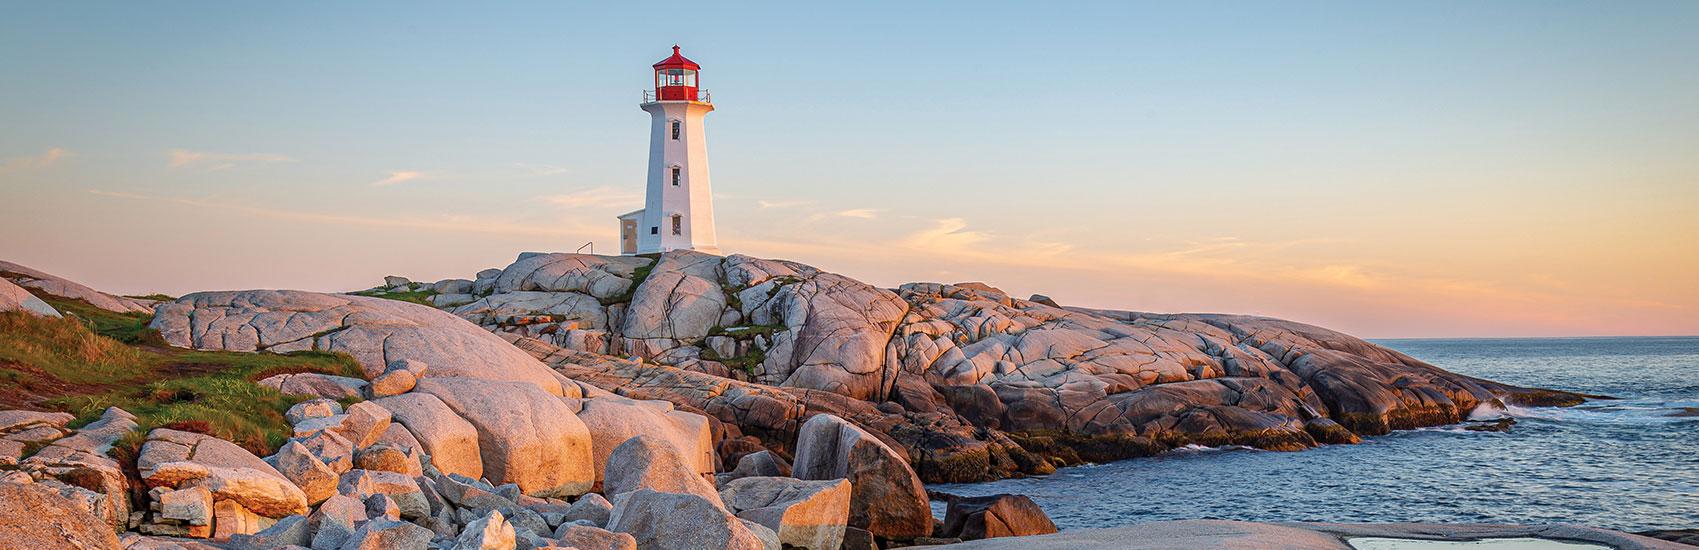 Exclusive Maritime Coastal Wonders Tour